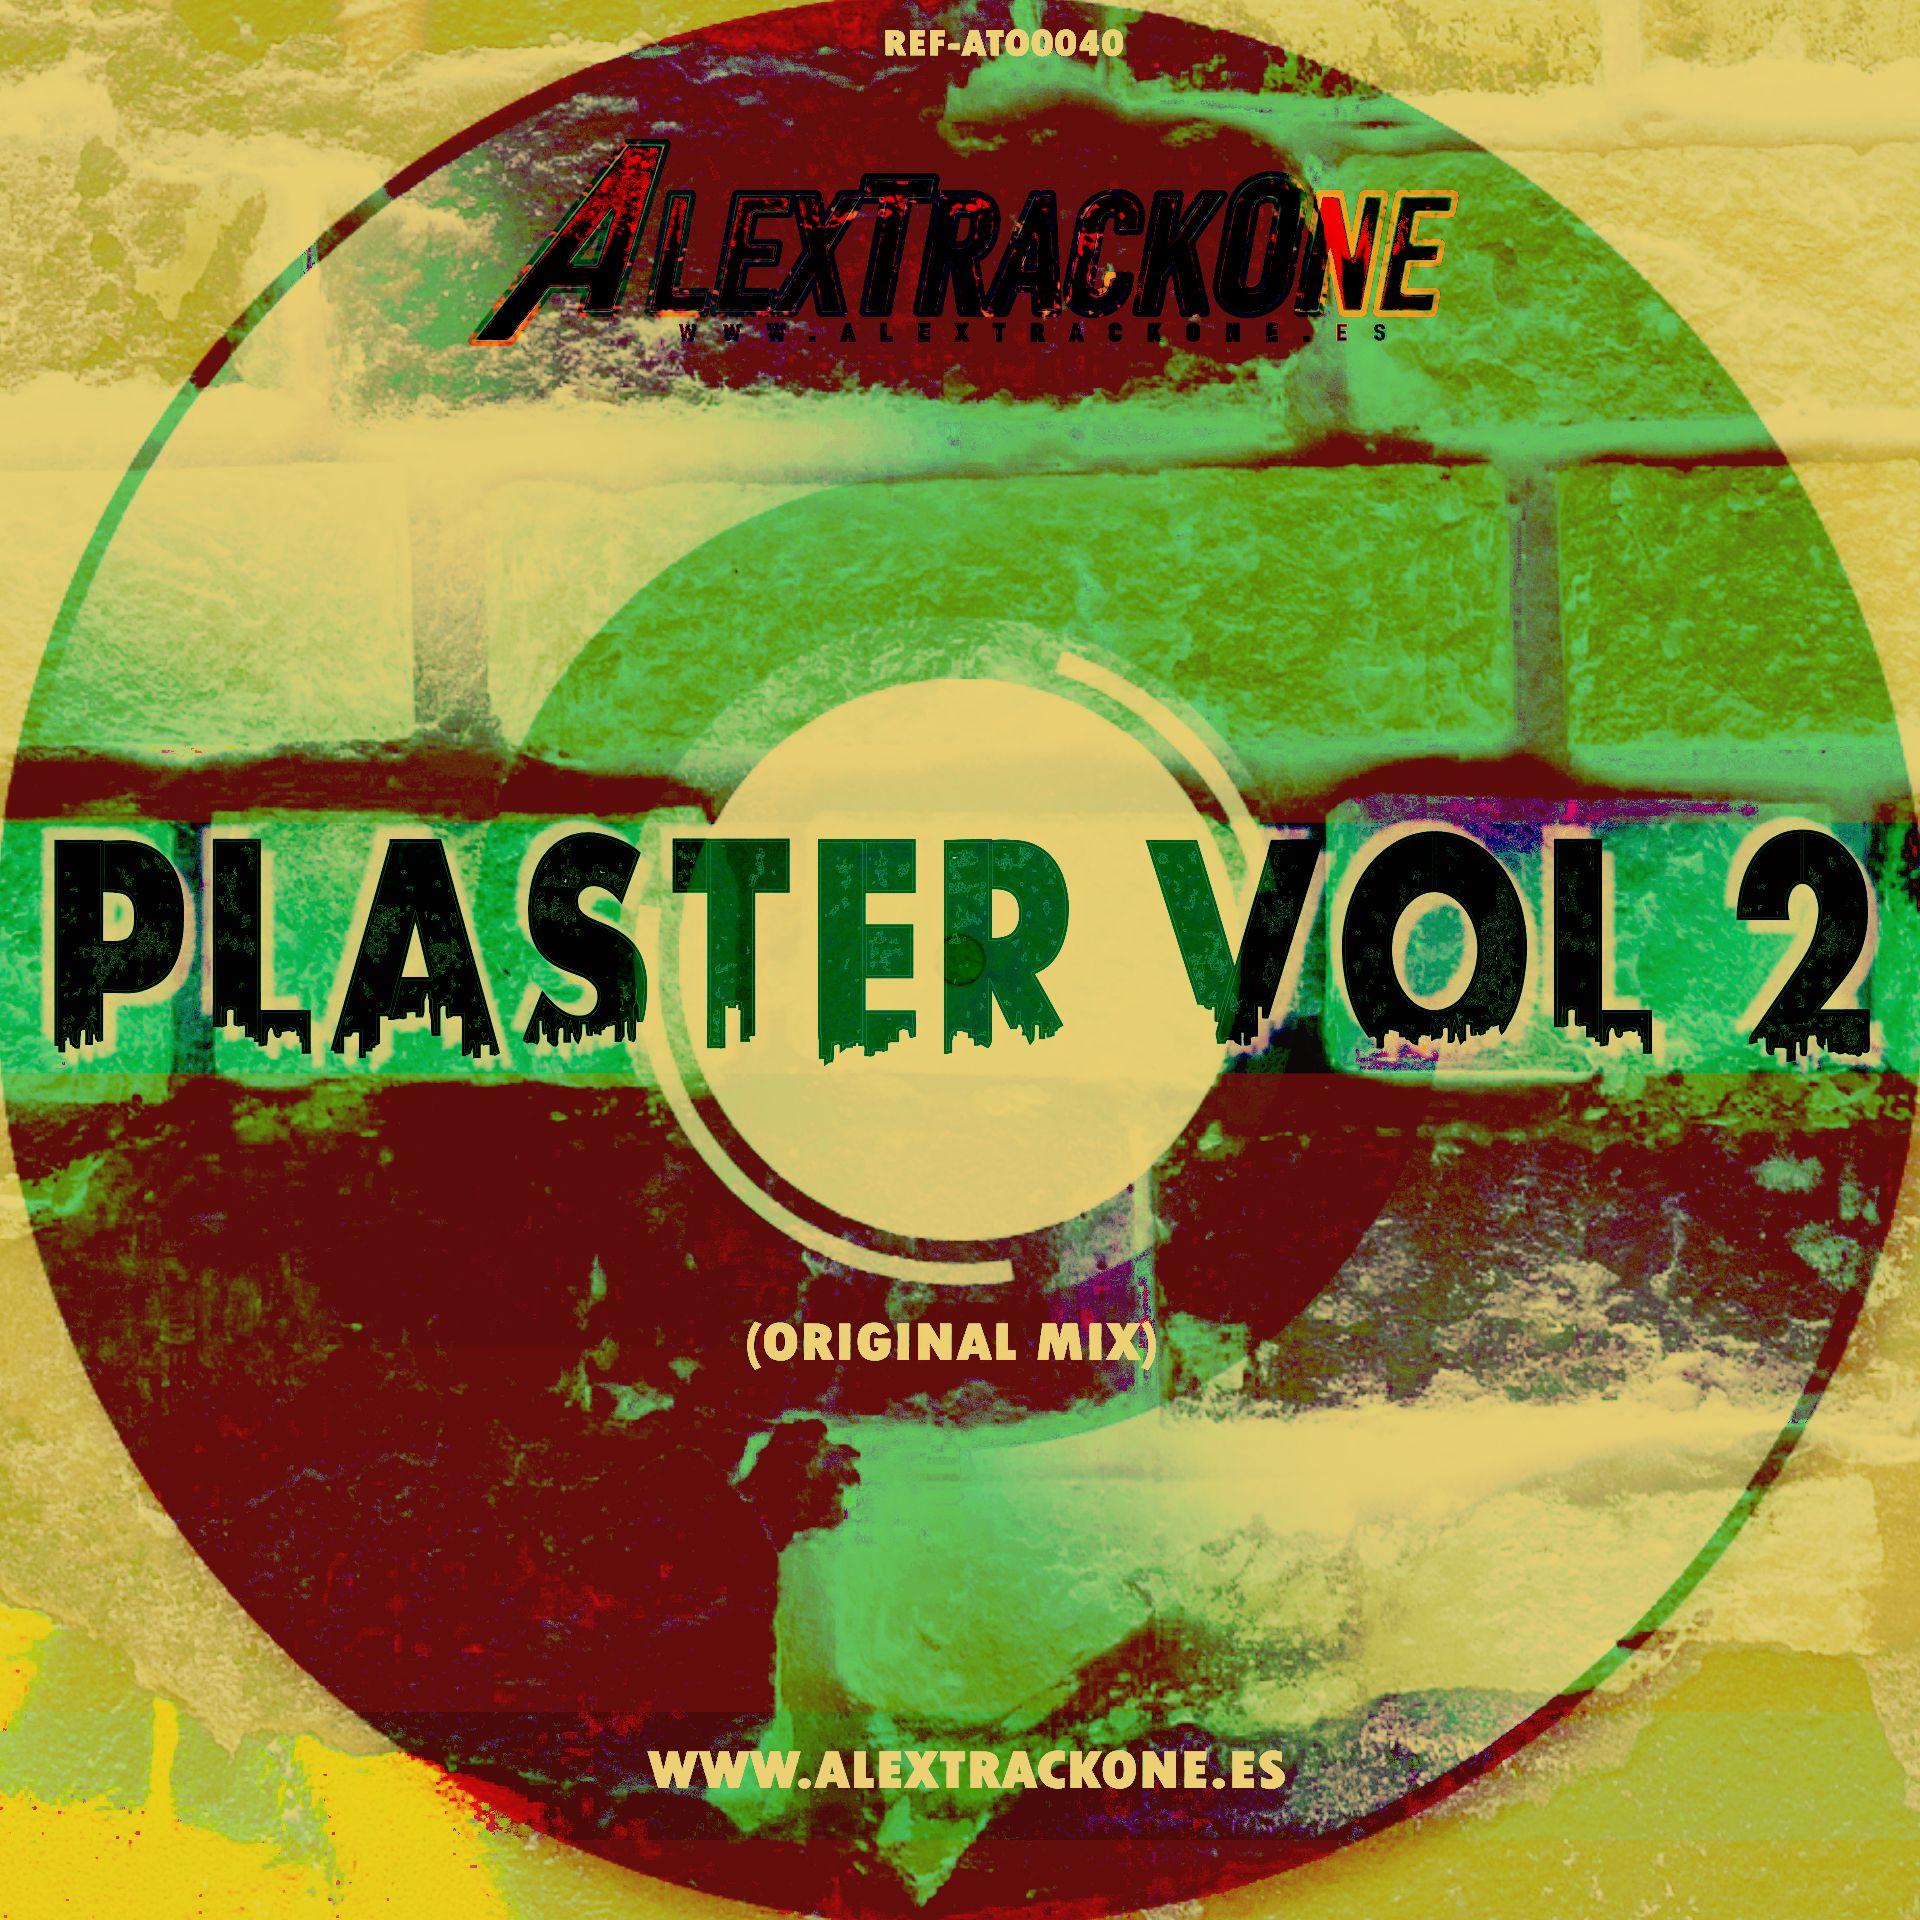 REF-ATO0040 PLASTER VOLUME 2 (ORIGINAL MIX) (MP3 & WAV)